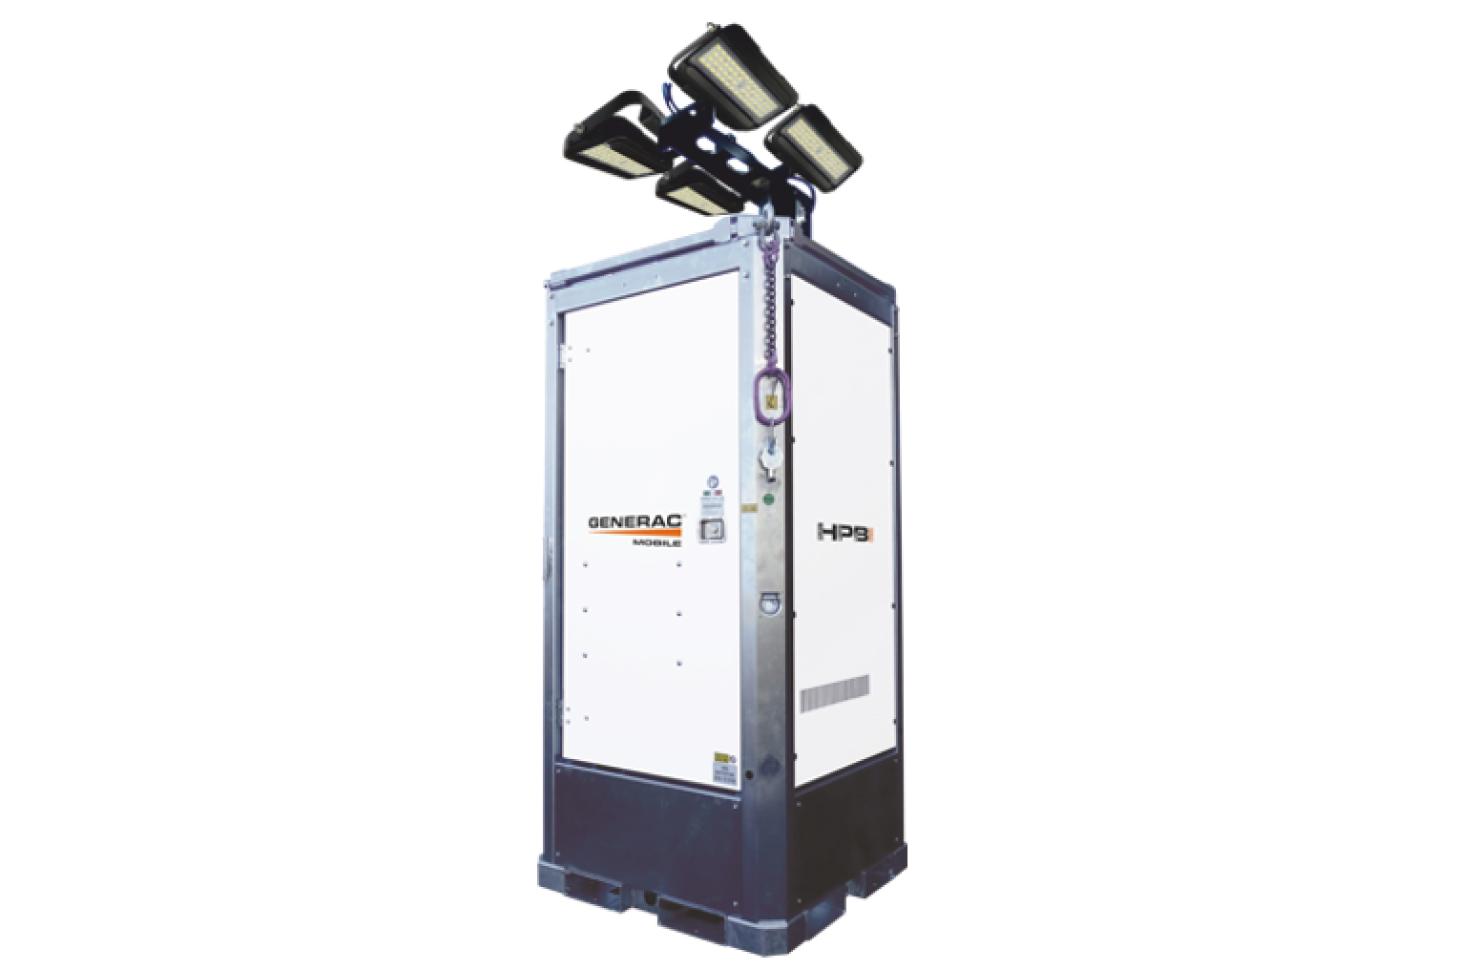 GENERAC MOBILE Hydro Power Box Hybrid Гибридная осветительная мачта